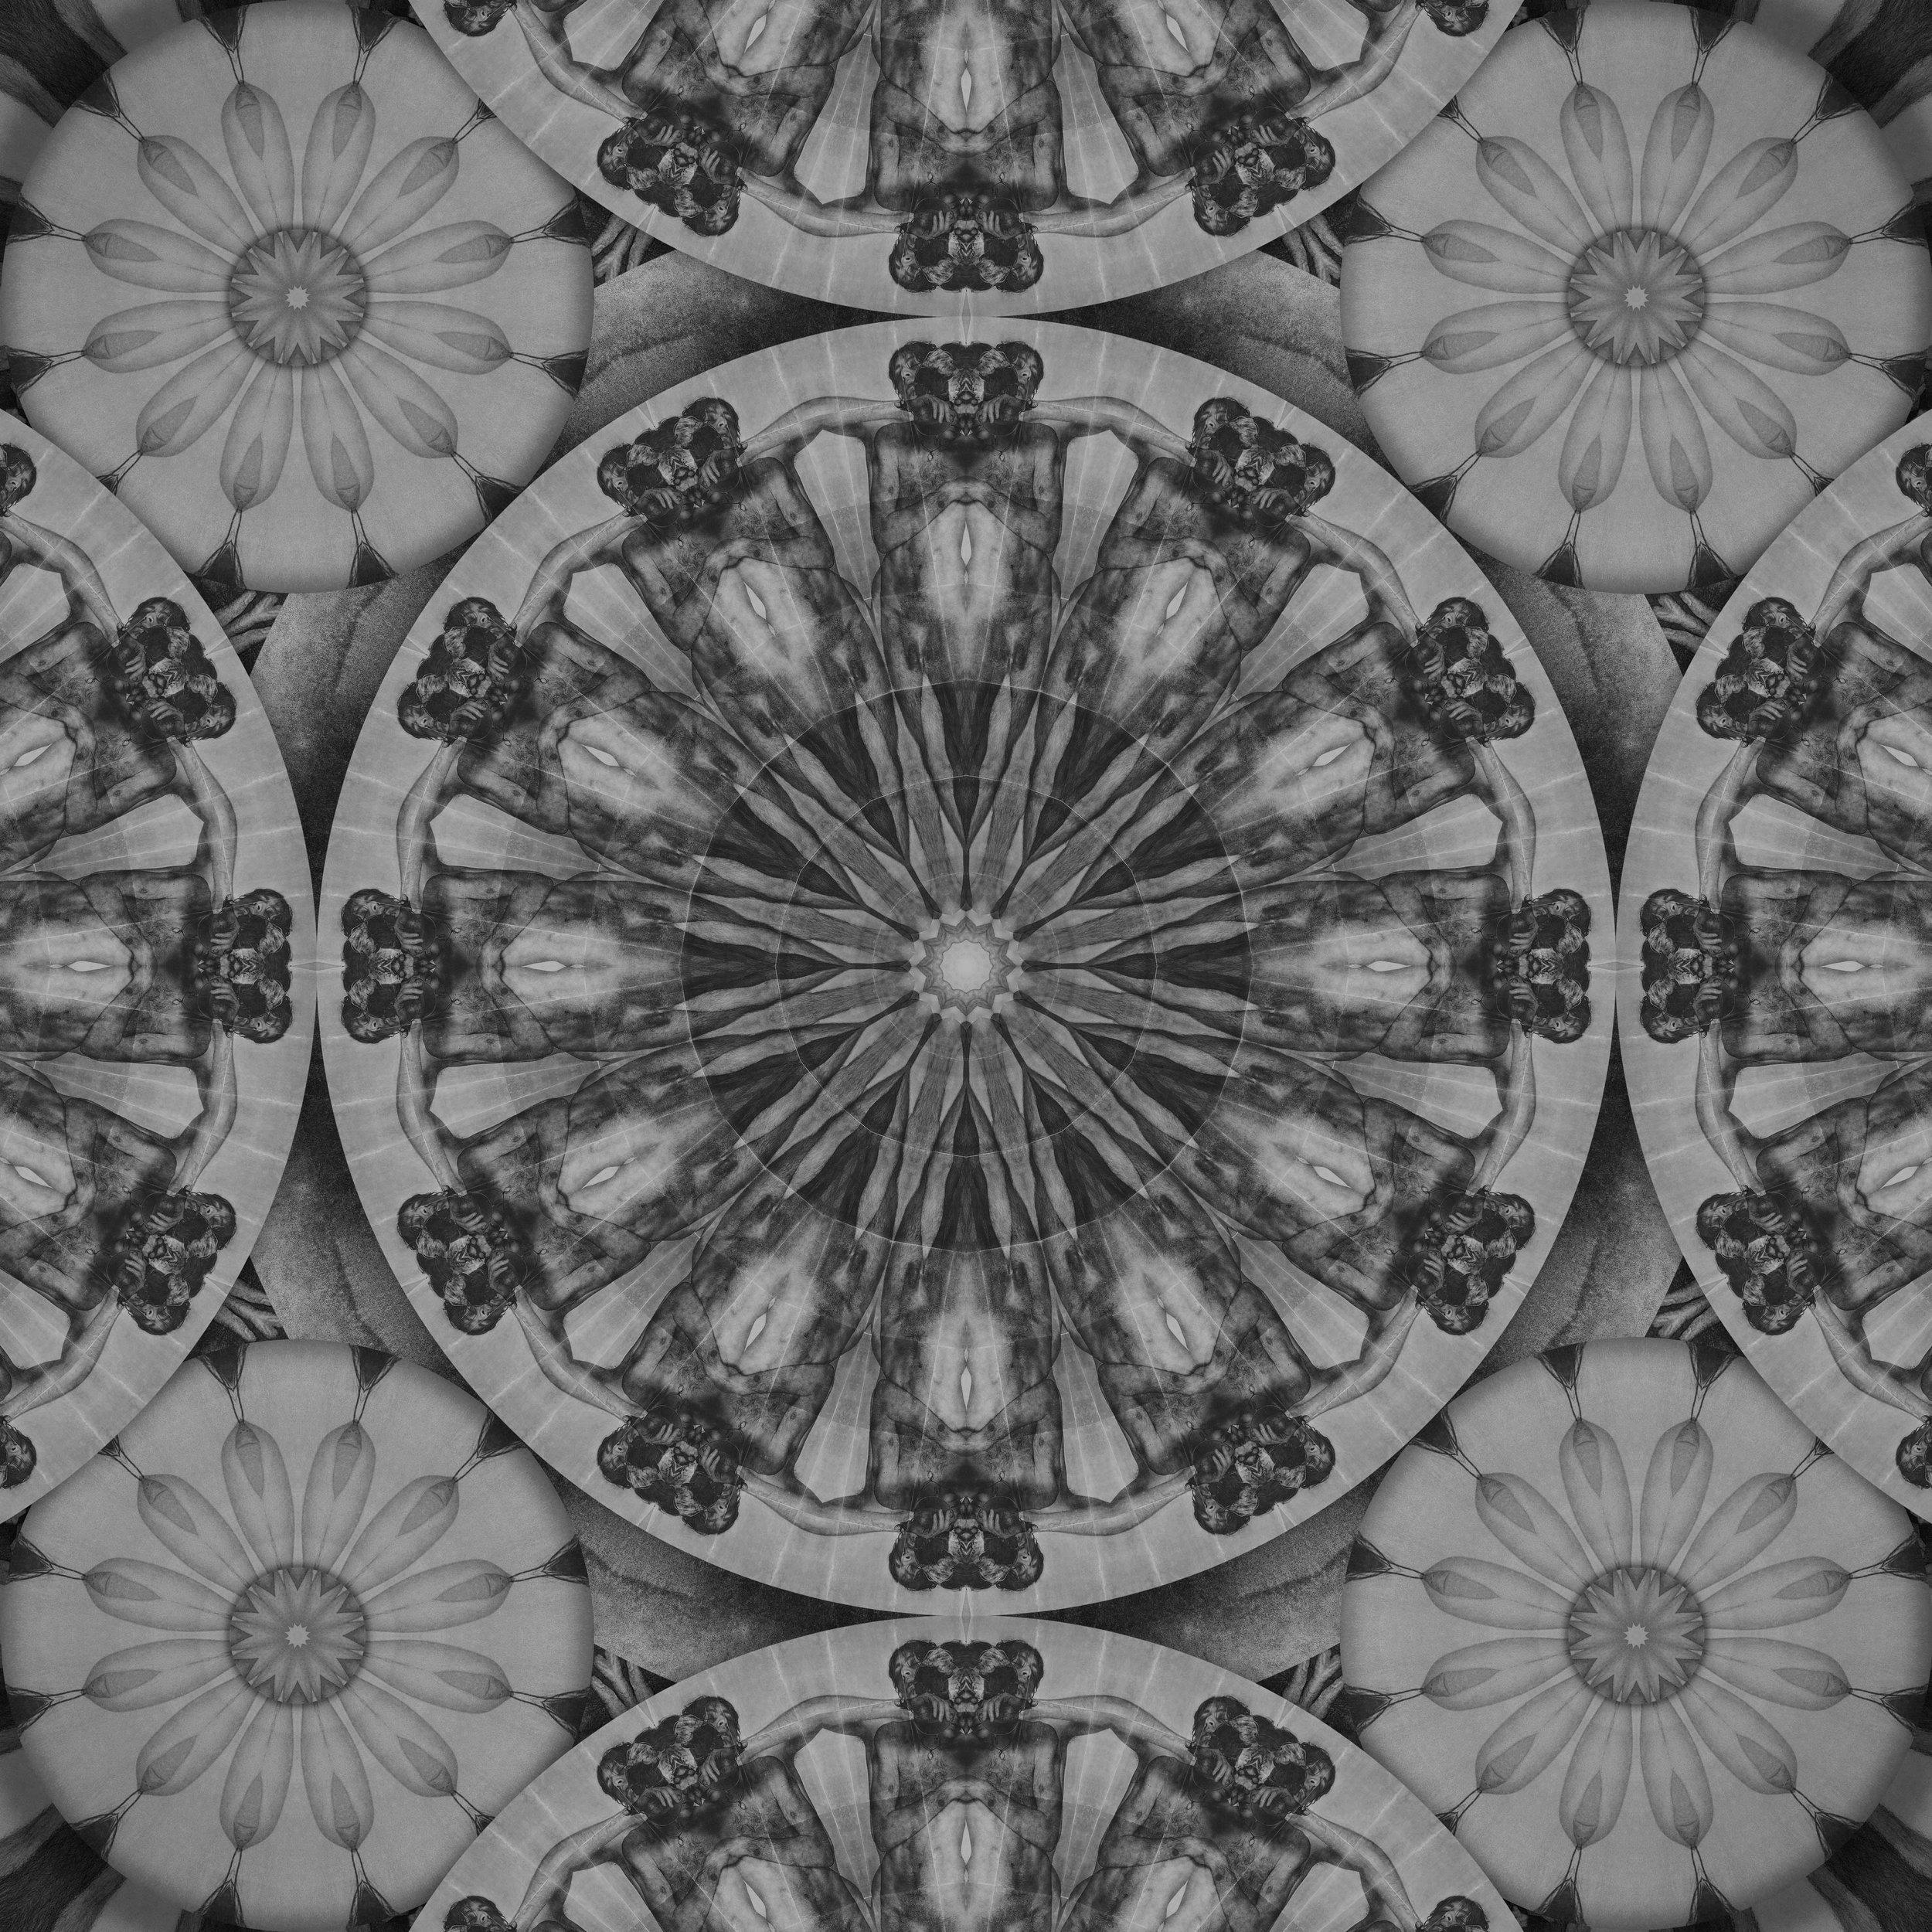 Large_Middle_Mandala_70x70cm.jpg